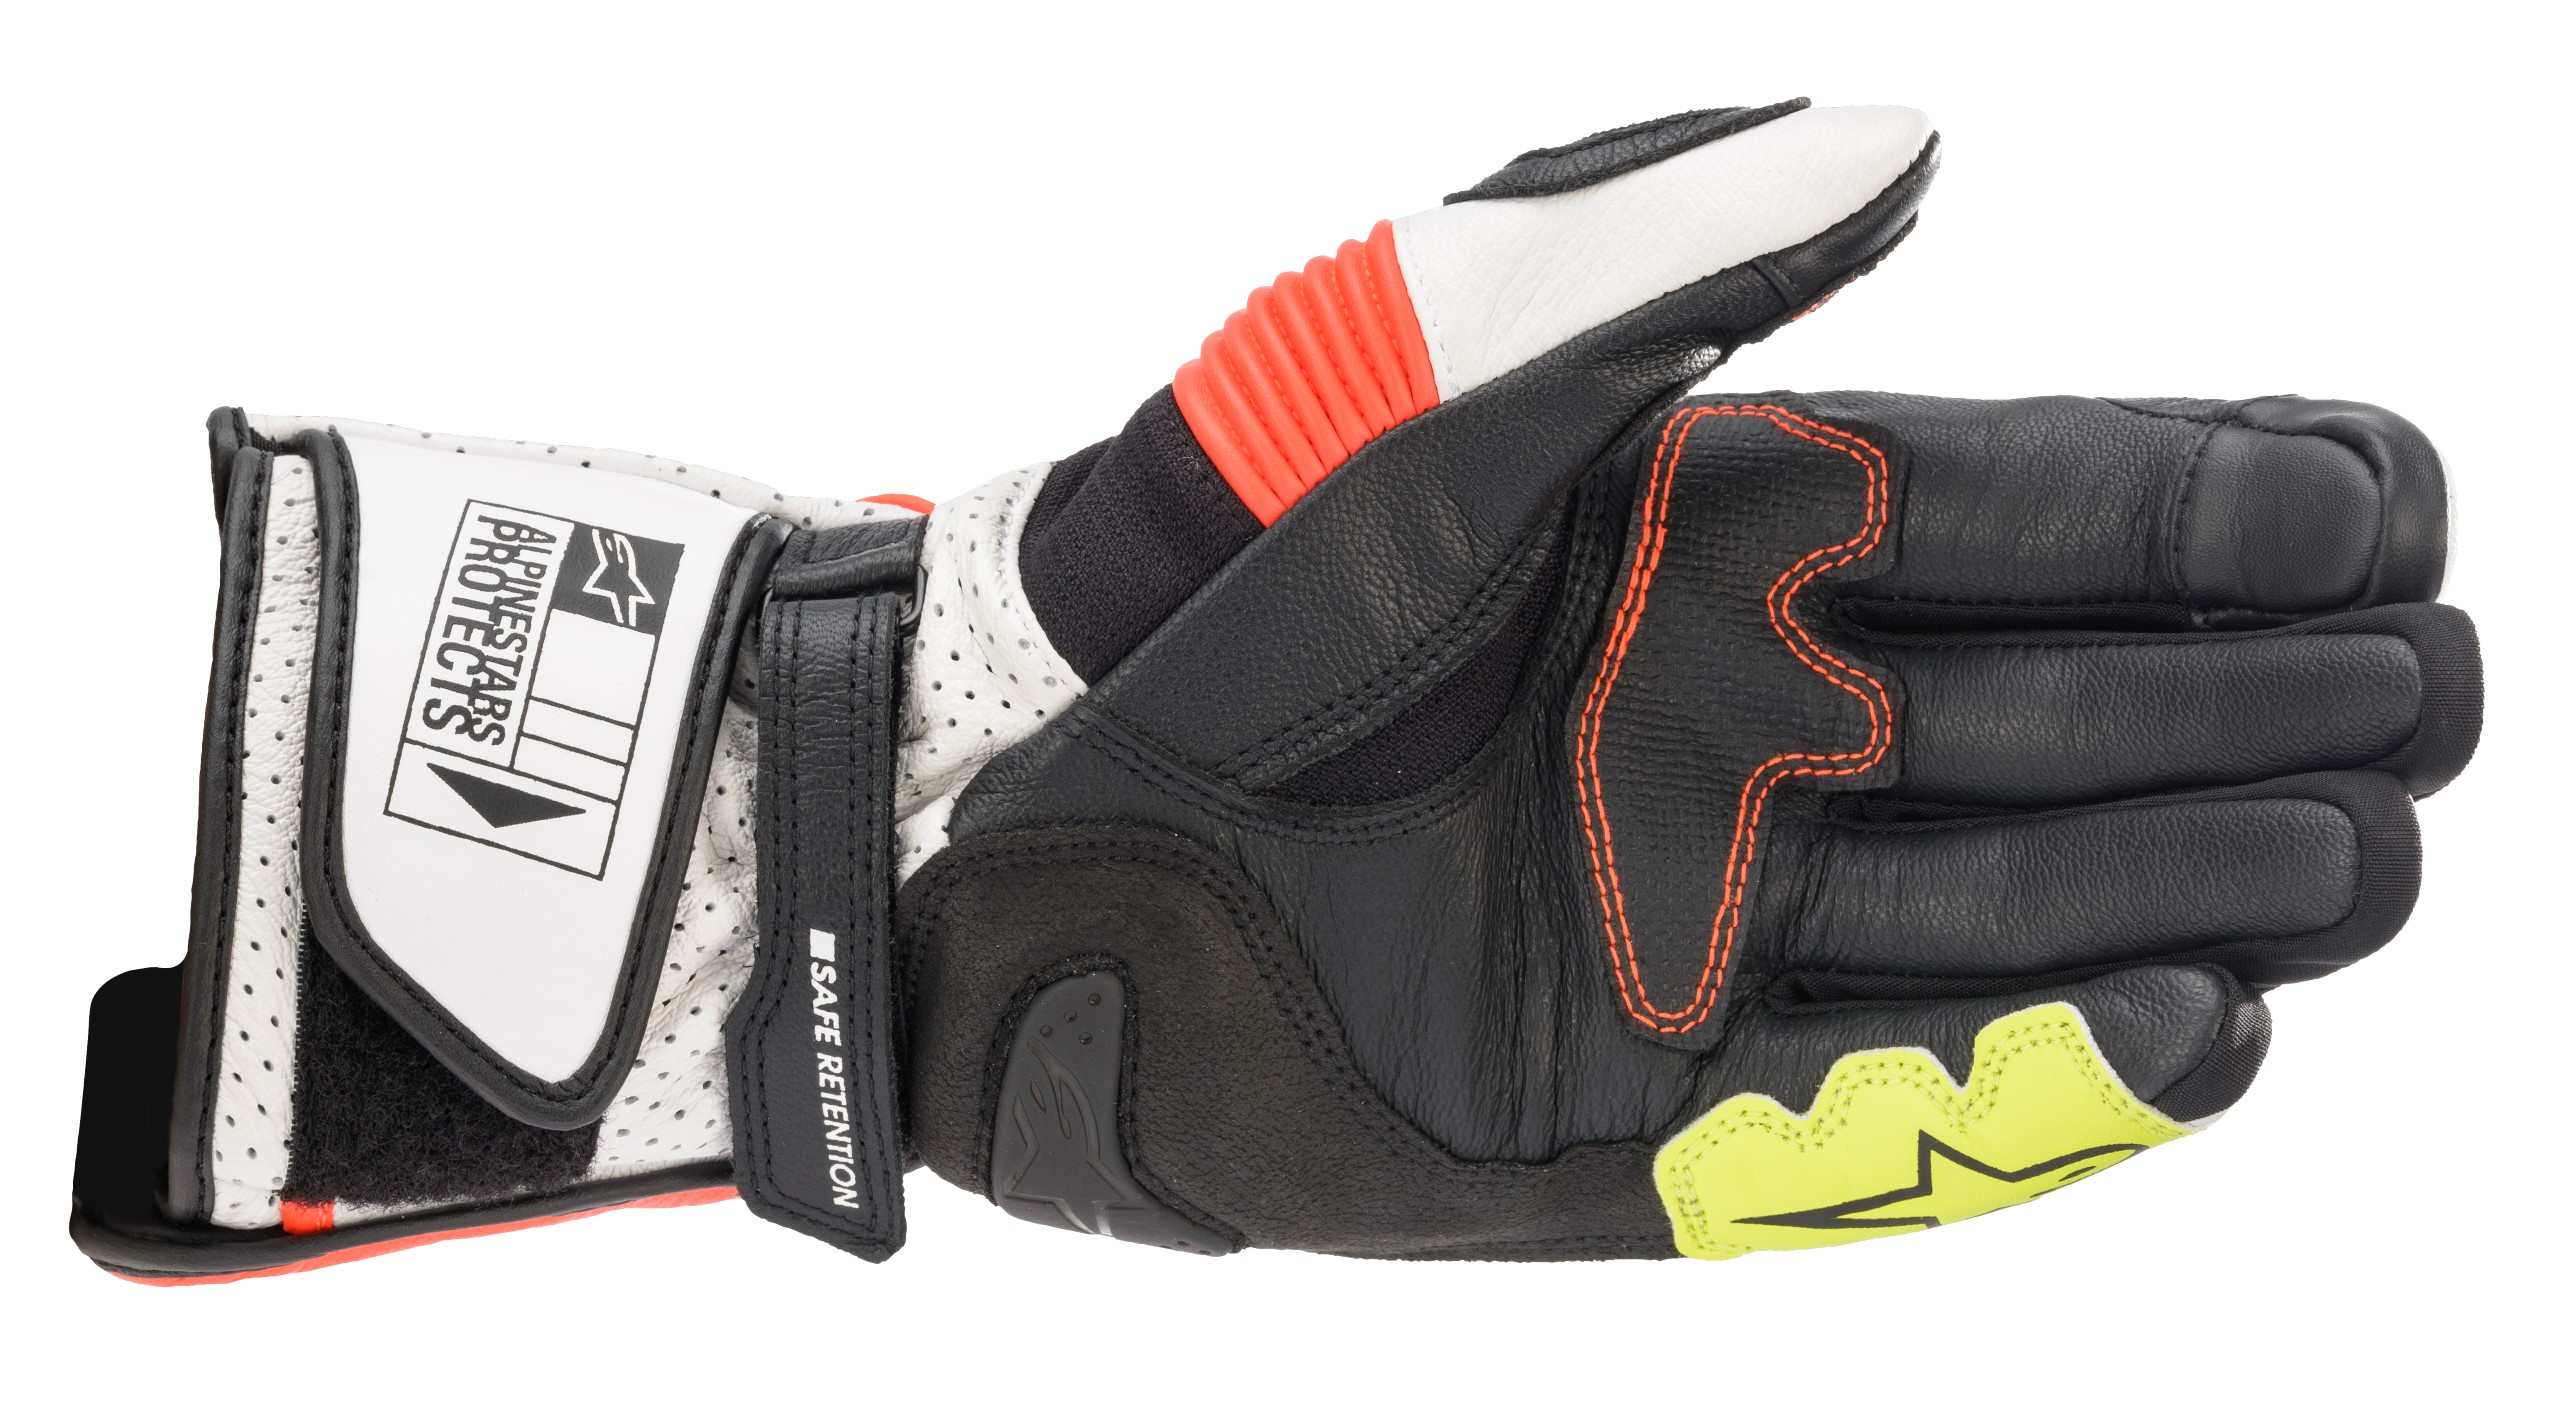 3558221-2310-ba_sp-2-v3-glove